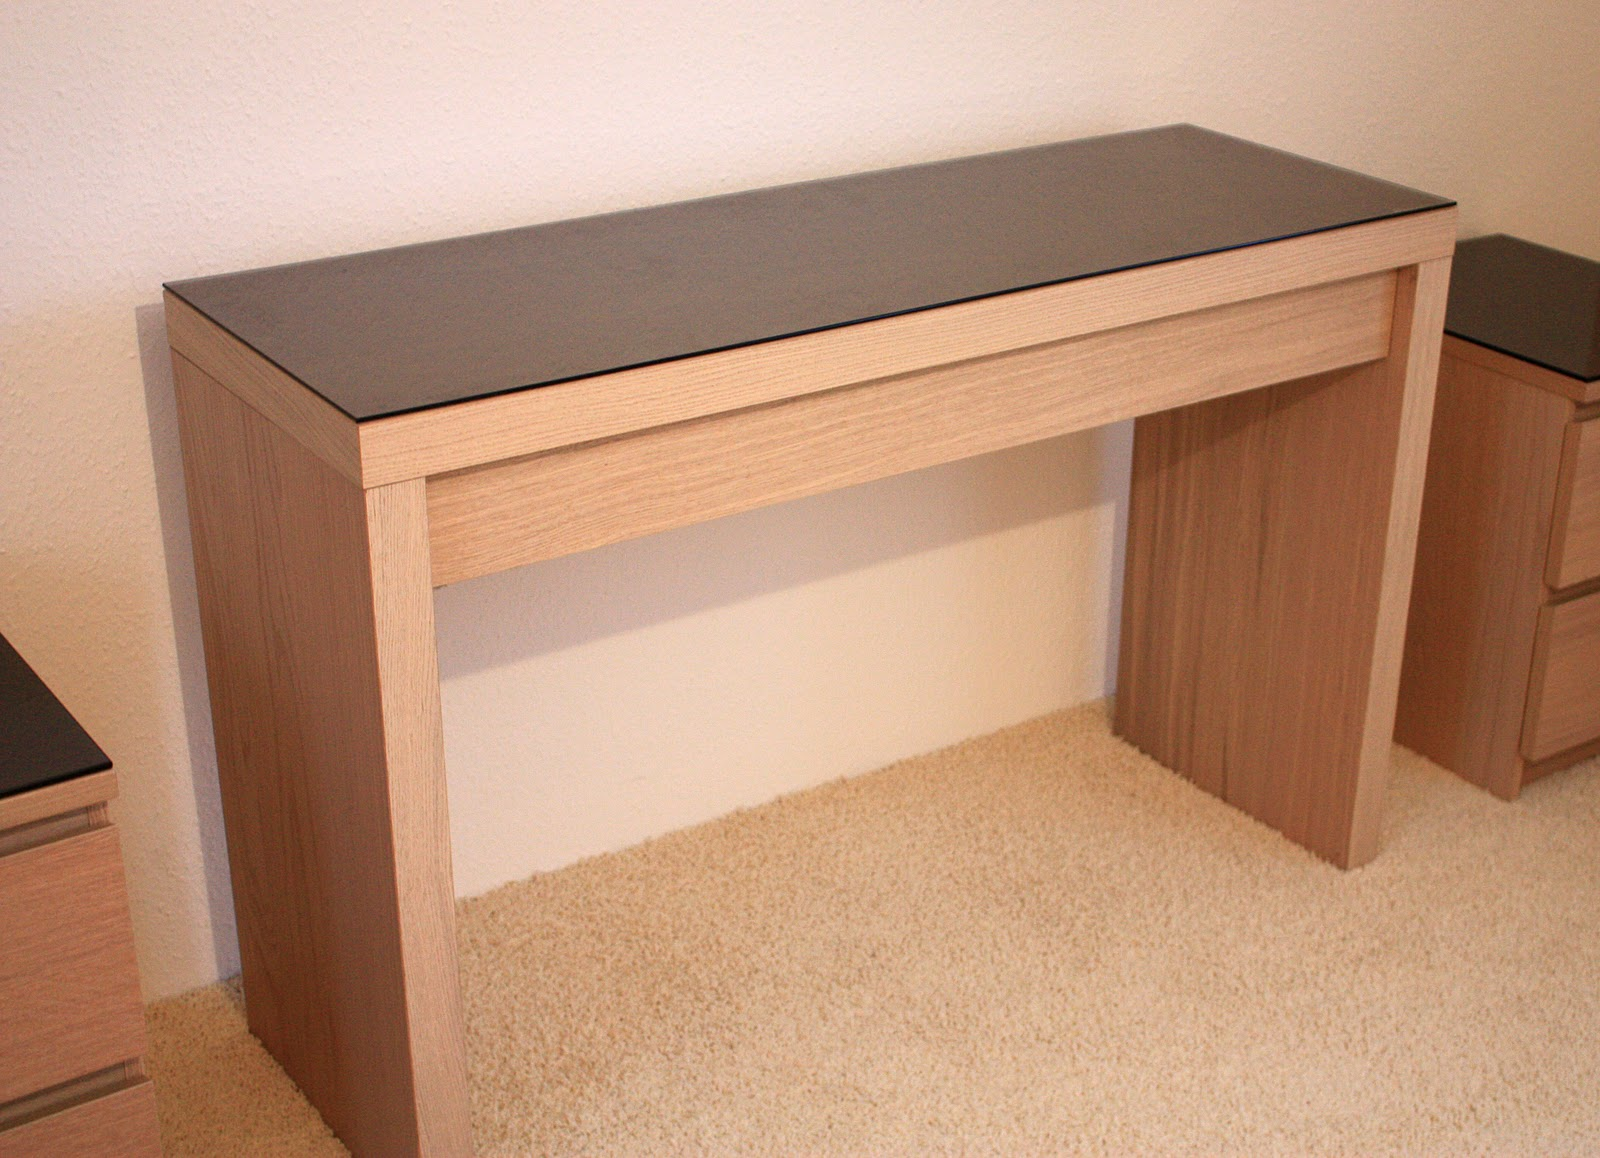 ikea schminktisch schreibtisch. Black Bedroom Furniture Sets. Home Design Ideas